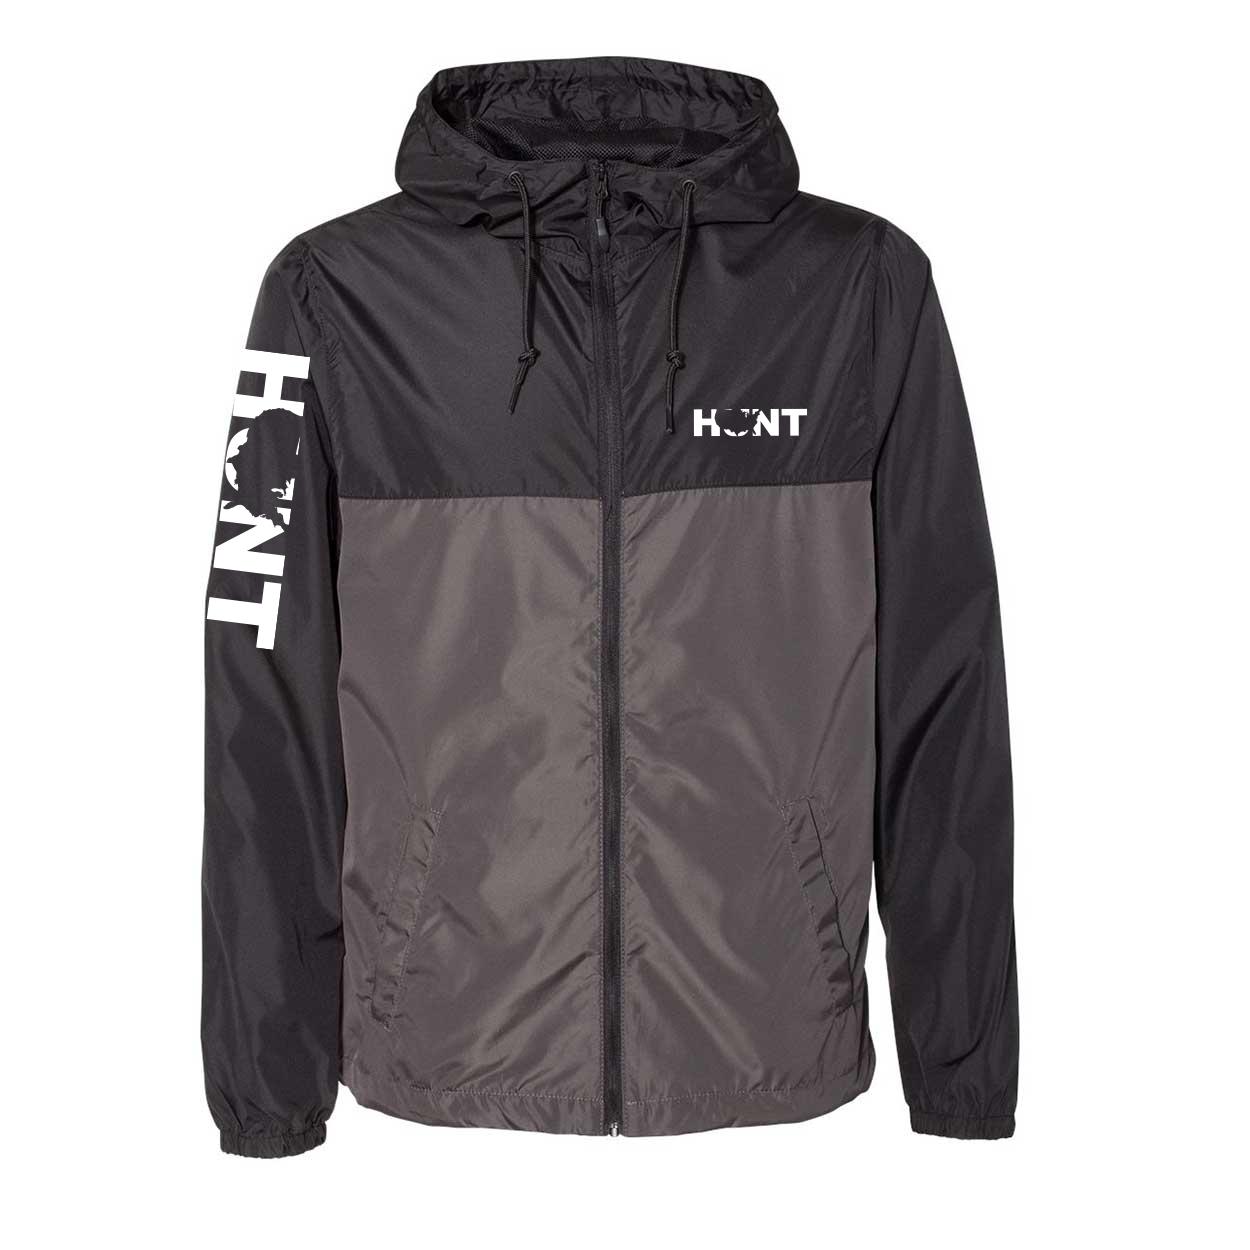 Hunt United States Classic Lightweight Windbreaker Black/Graphite (White Logo)